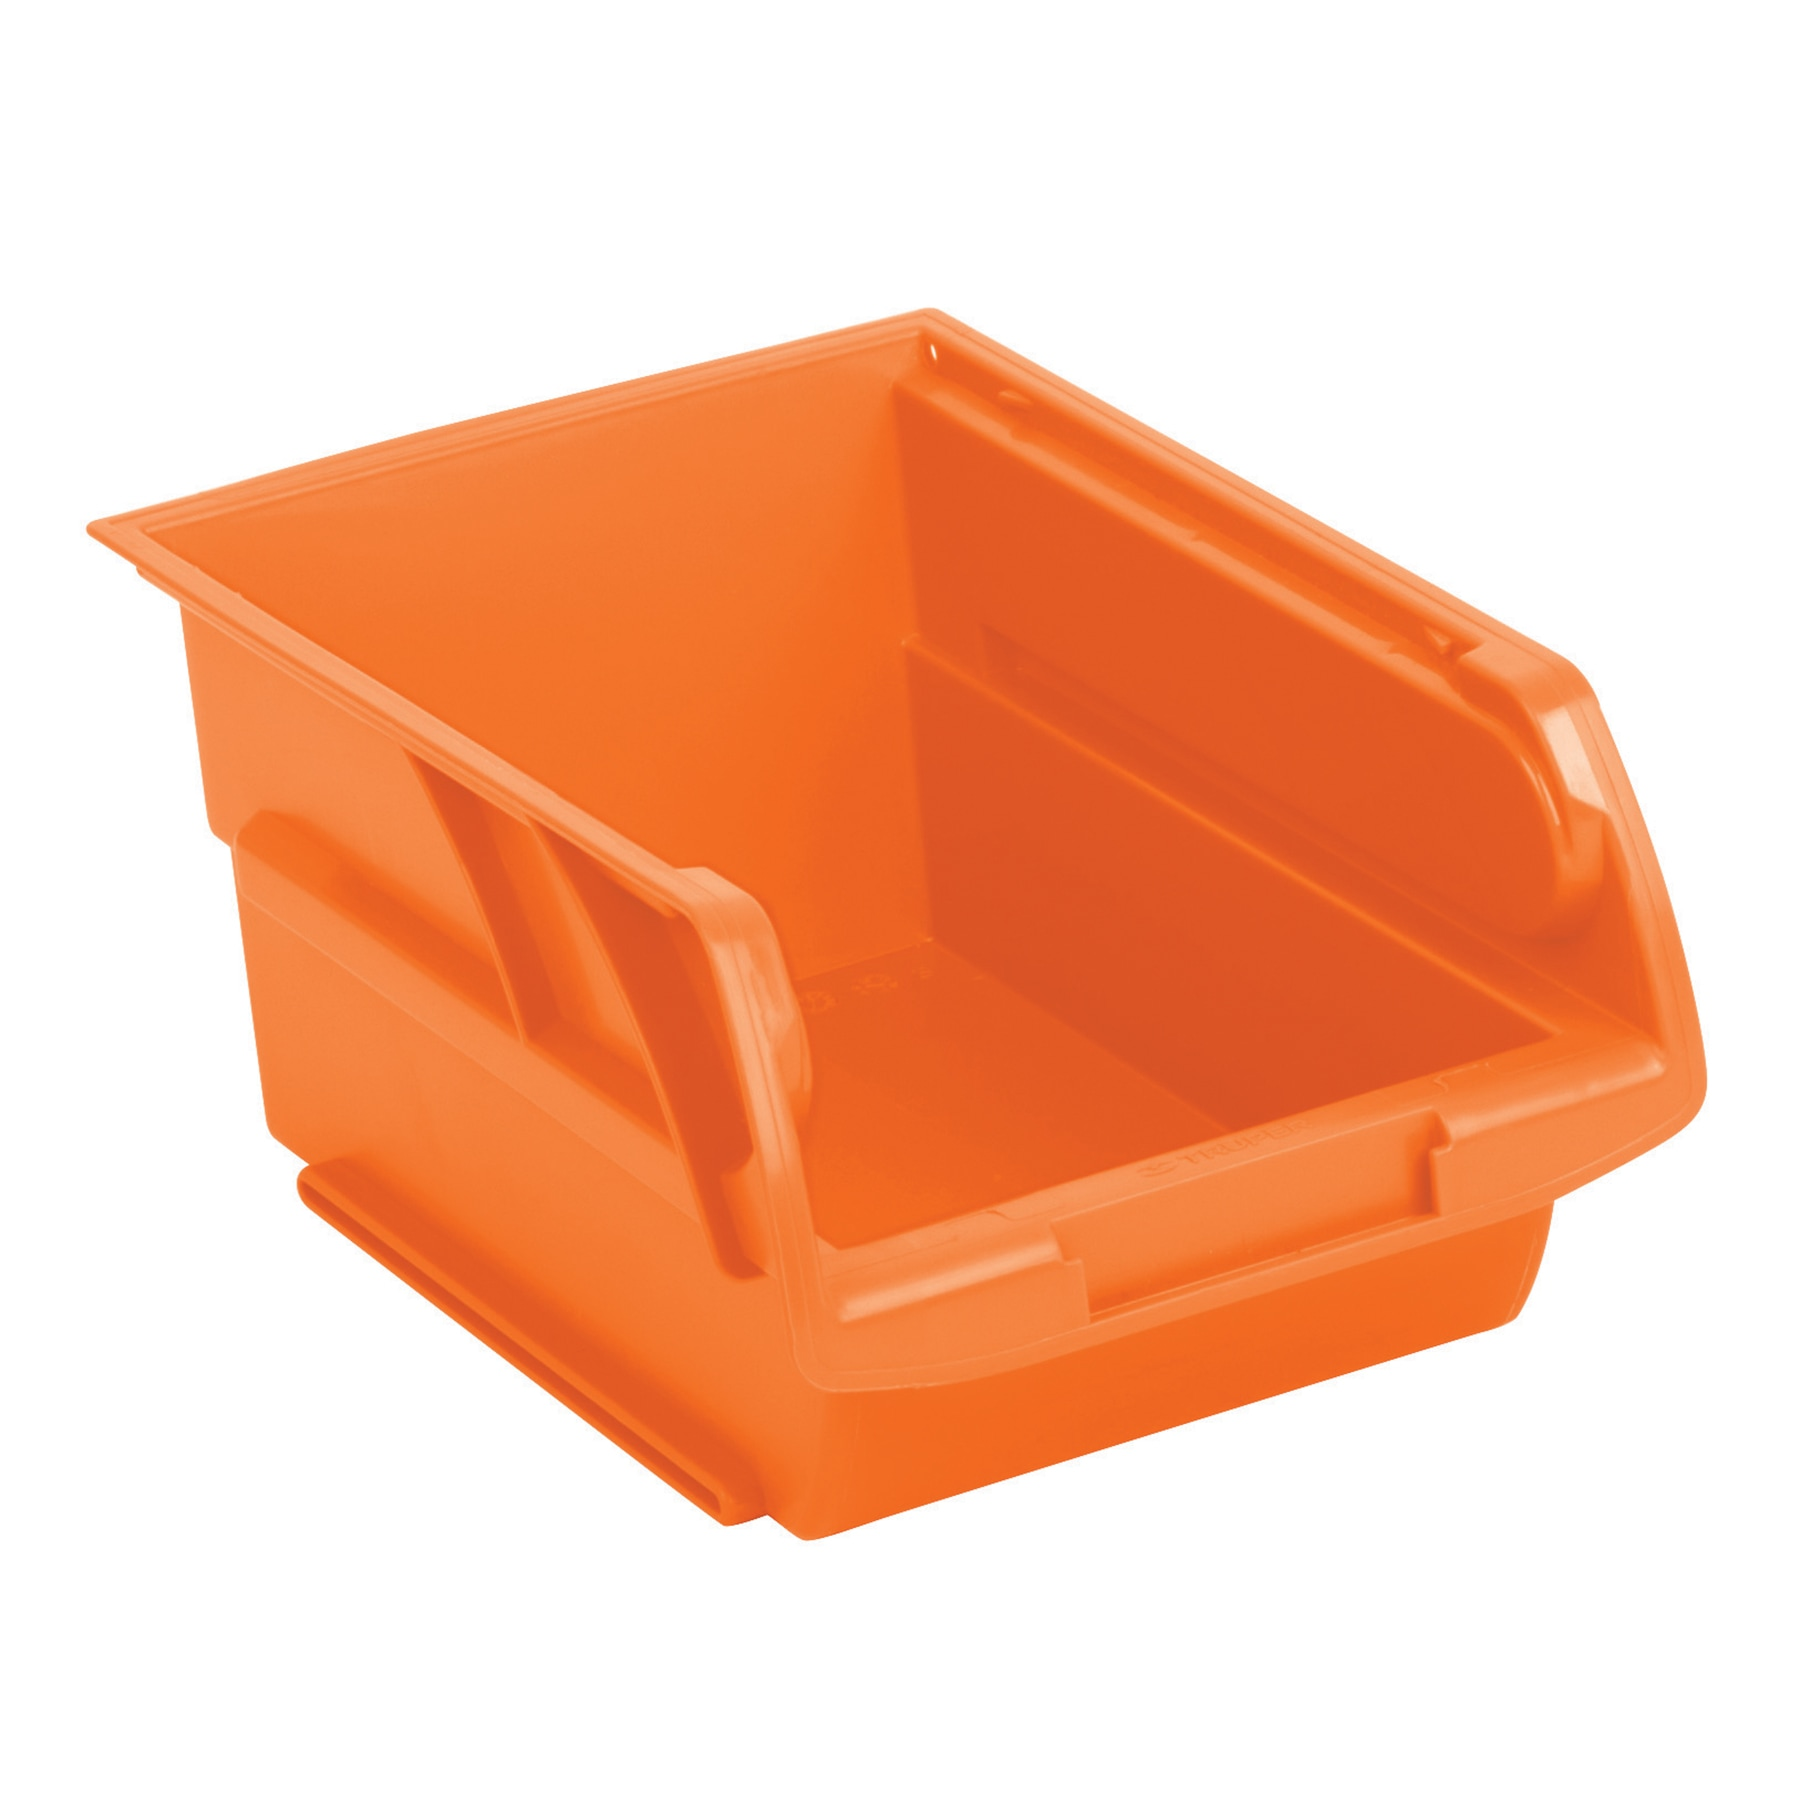 Gaveta apilable de plástico, 16.5 x 10.5 x 7.5 cm